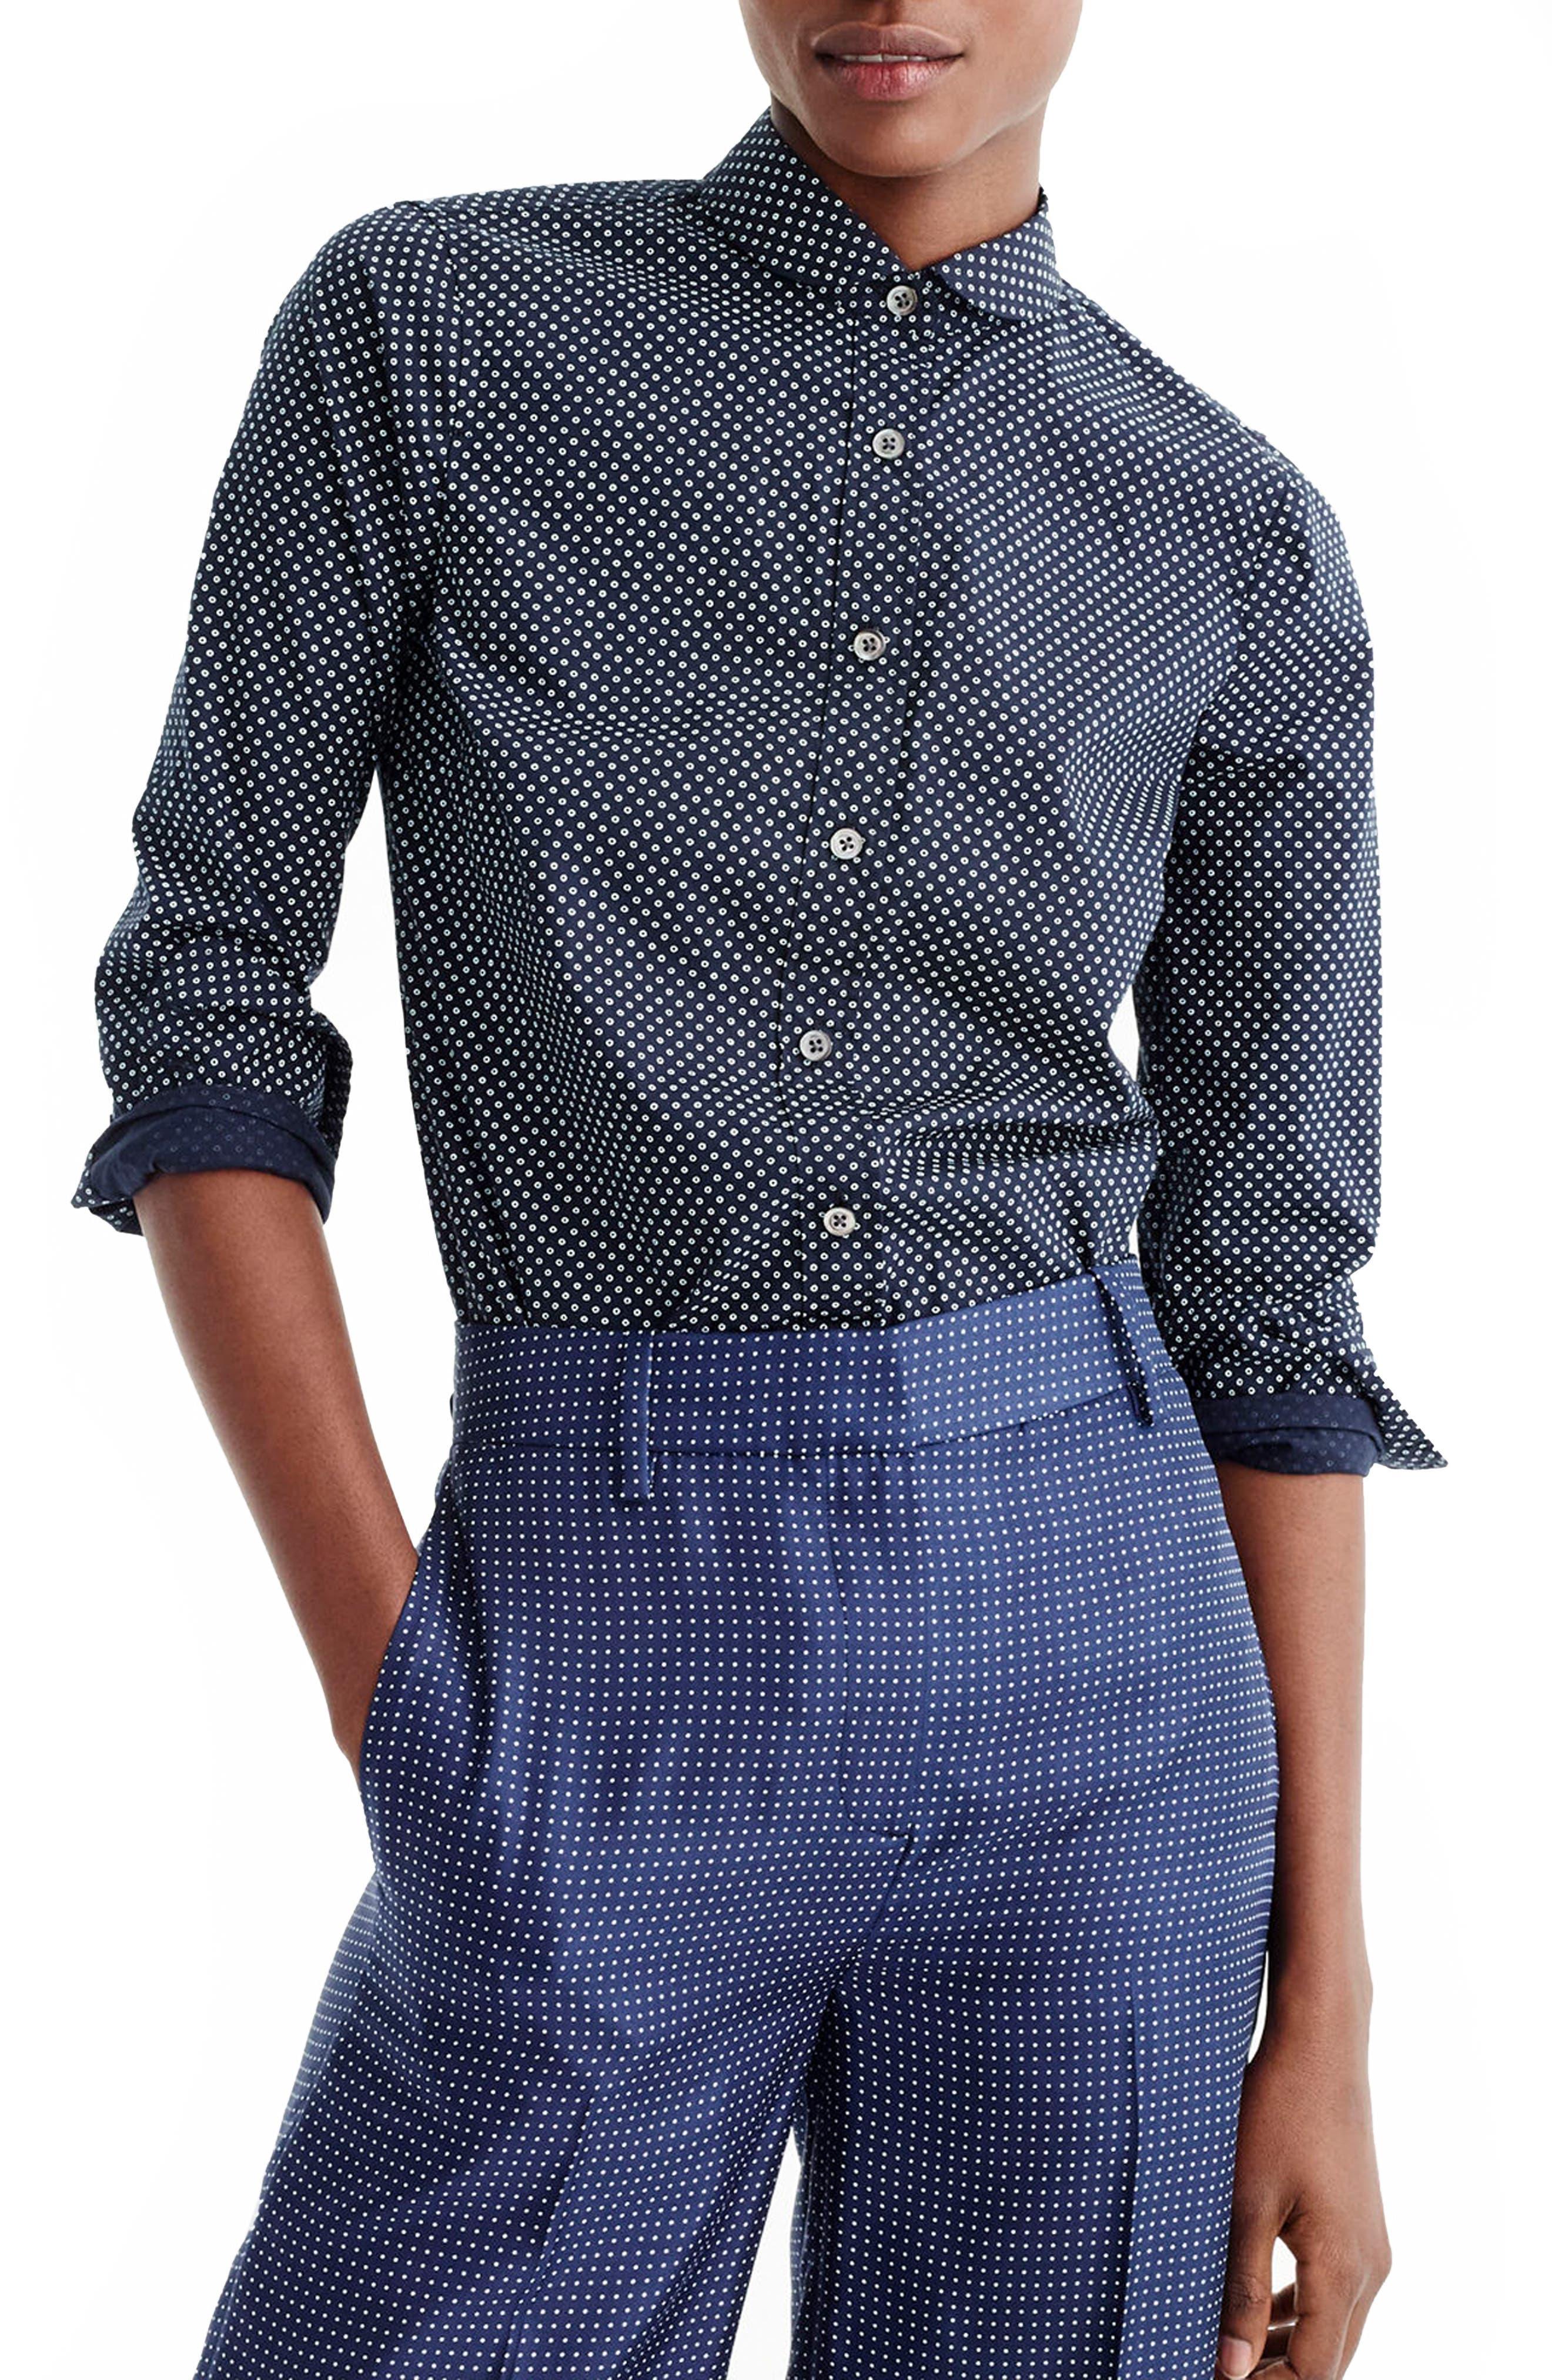 Alternate Image 1 Selected - J.Crew Polka Dot Button-Up Shirt (Regular & Petite)